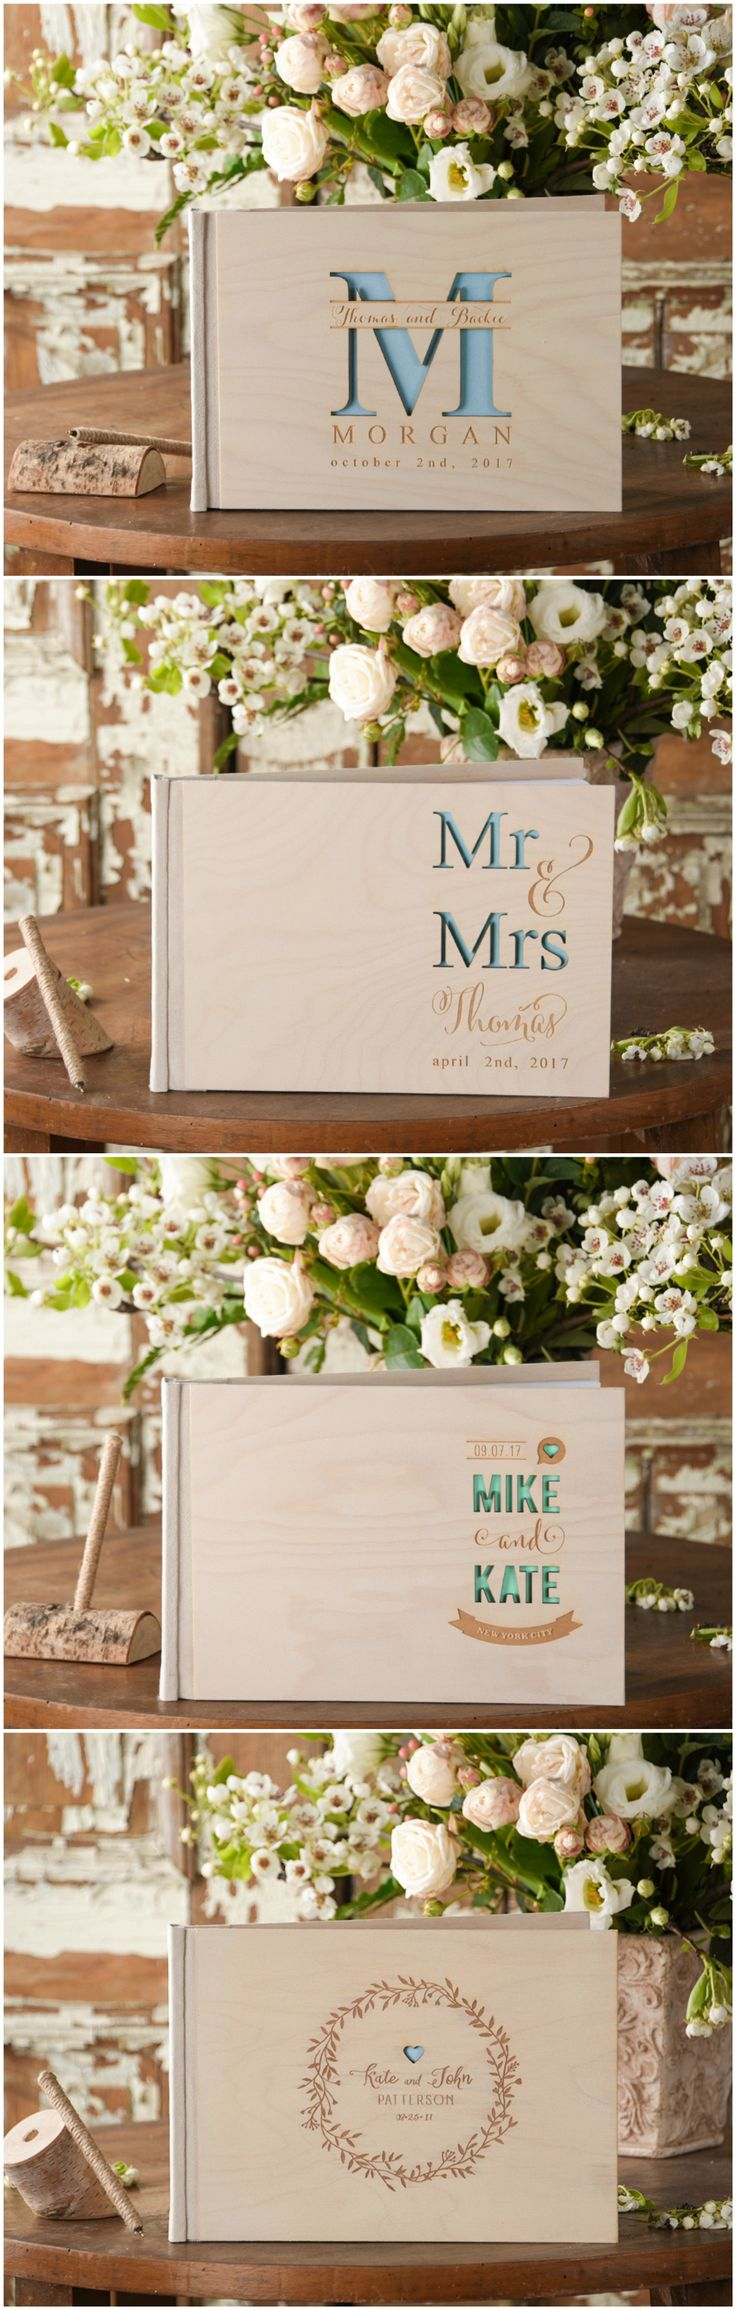 Wooden Wedding Guest Books with custom engraving #wood #rustic #wedding #boho #handmade #realwood #weddingideas #weddinggift #custom